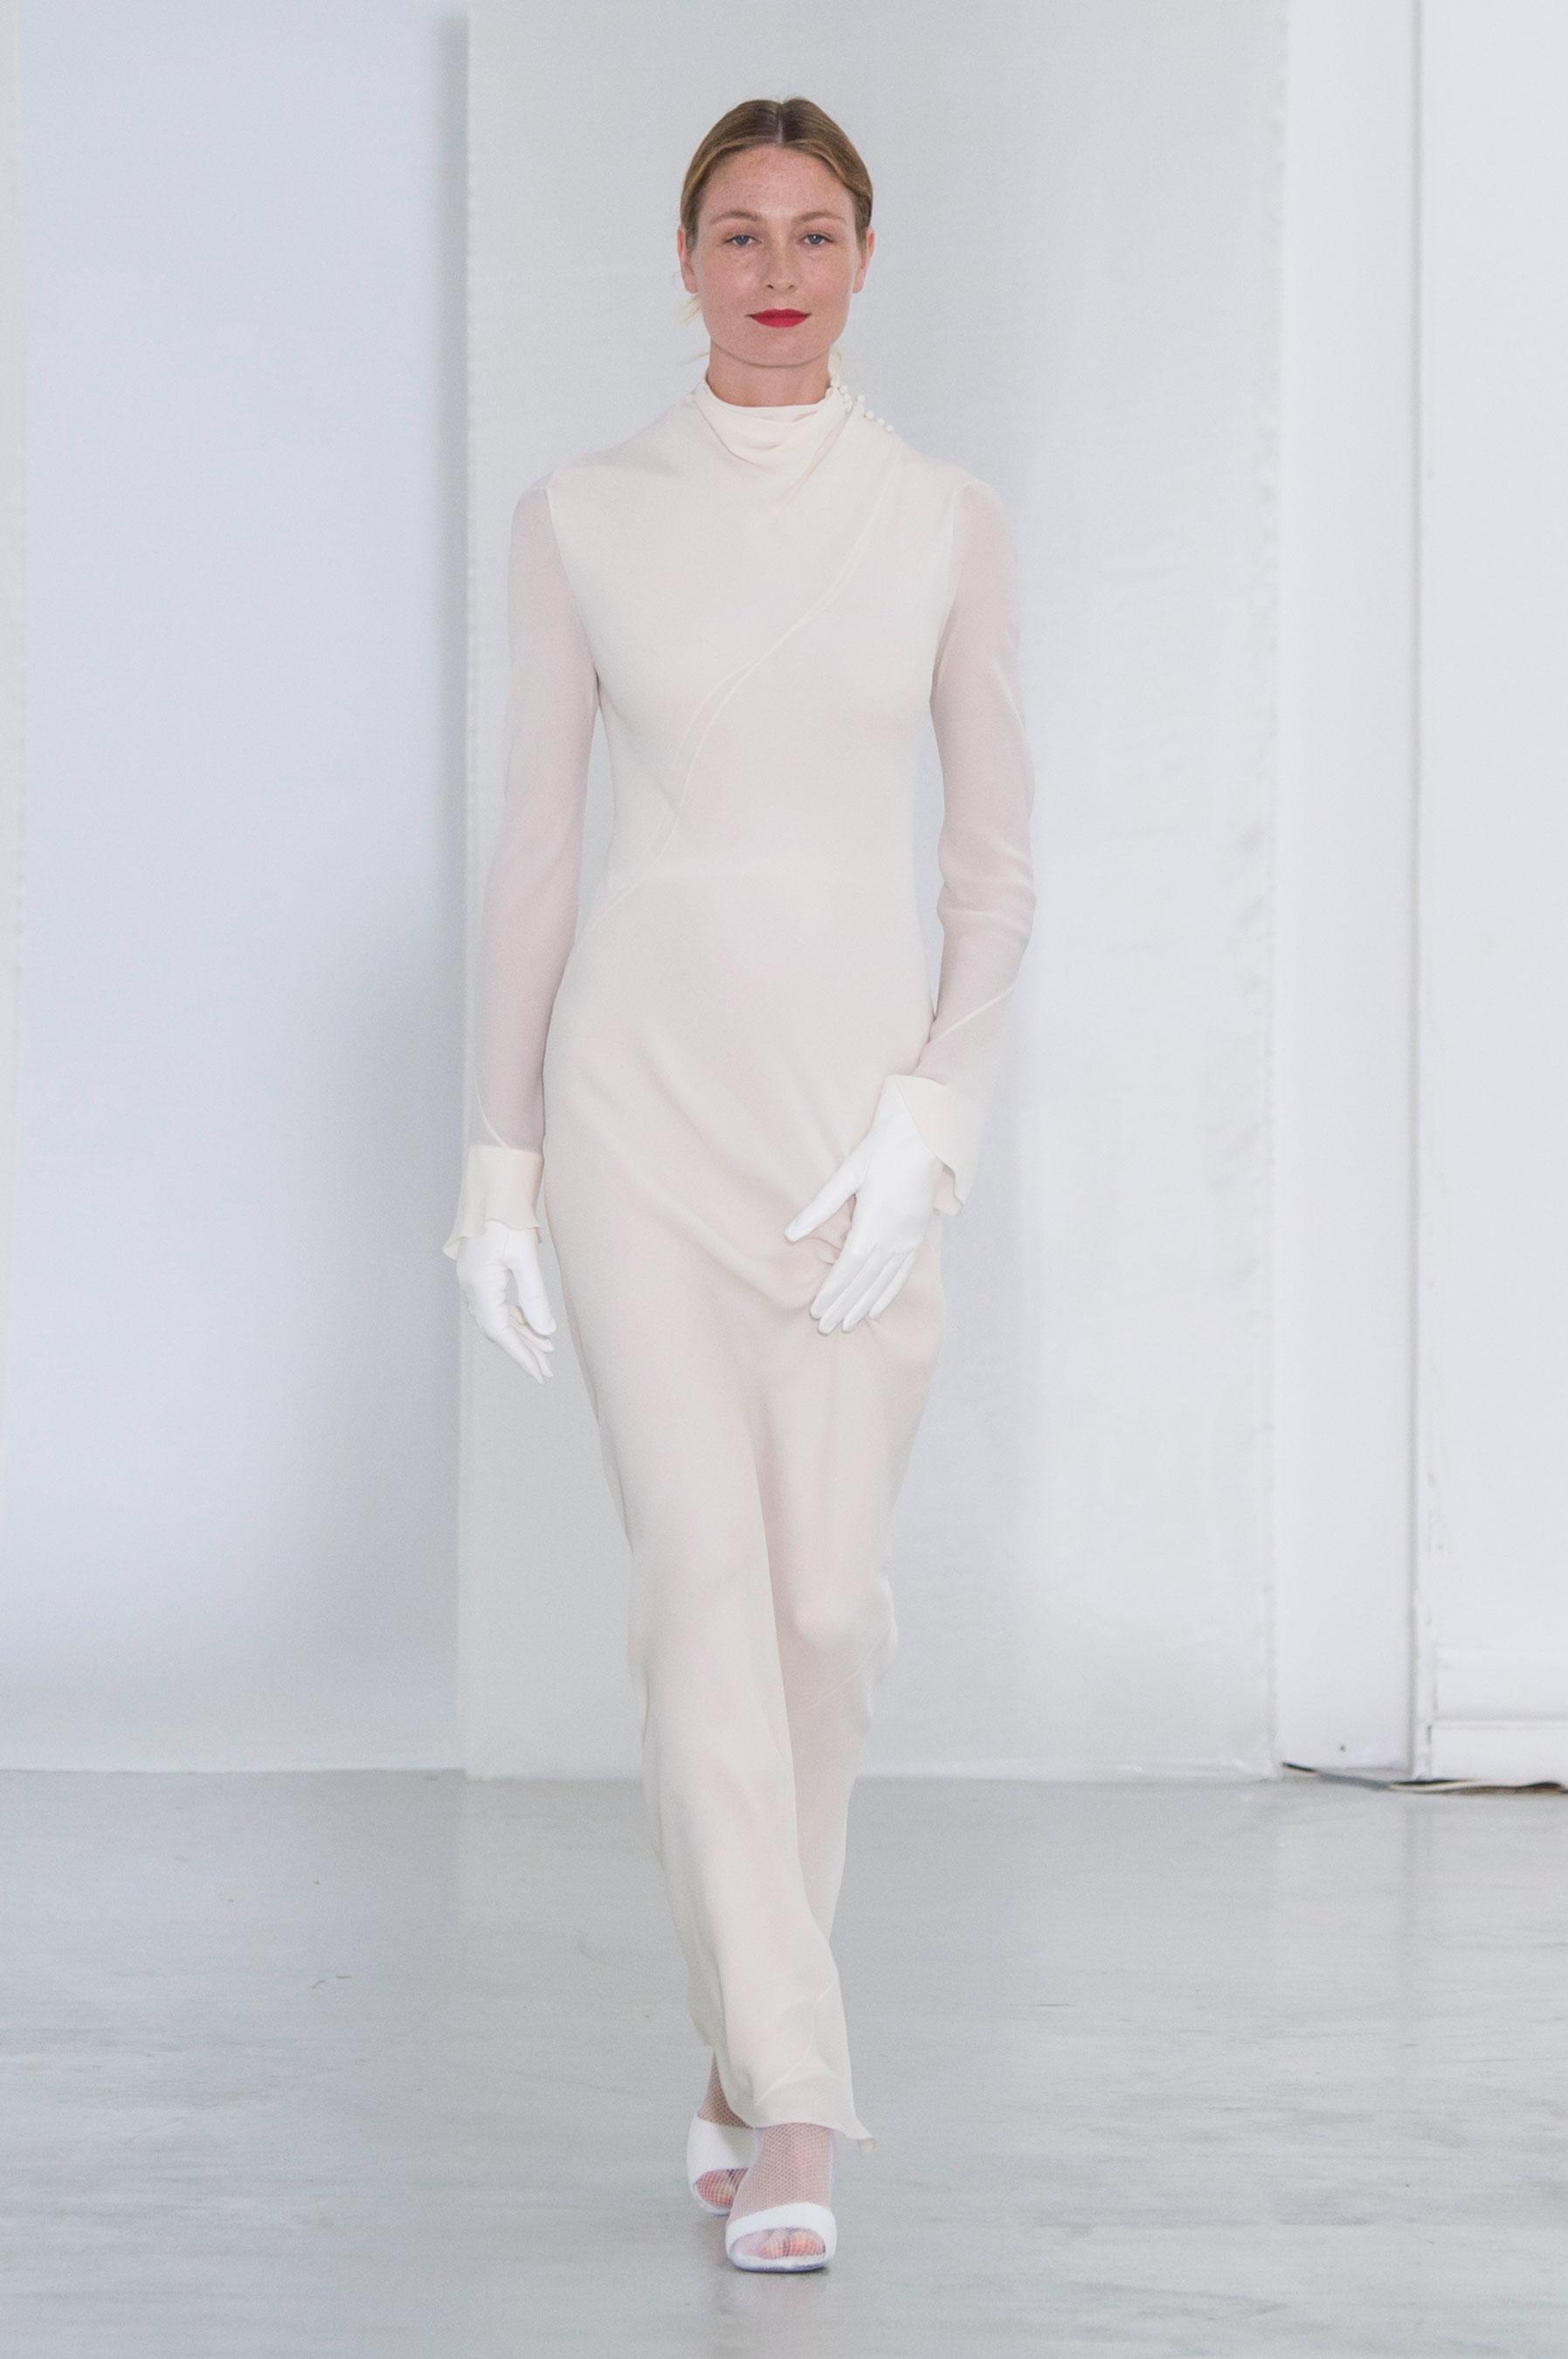 53e3cdd88a79ef Défilé Adeline André Automne-hiver 2015-2016 Couture - Madame Figaro